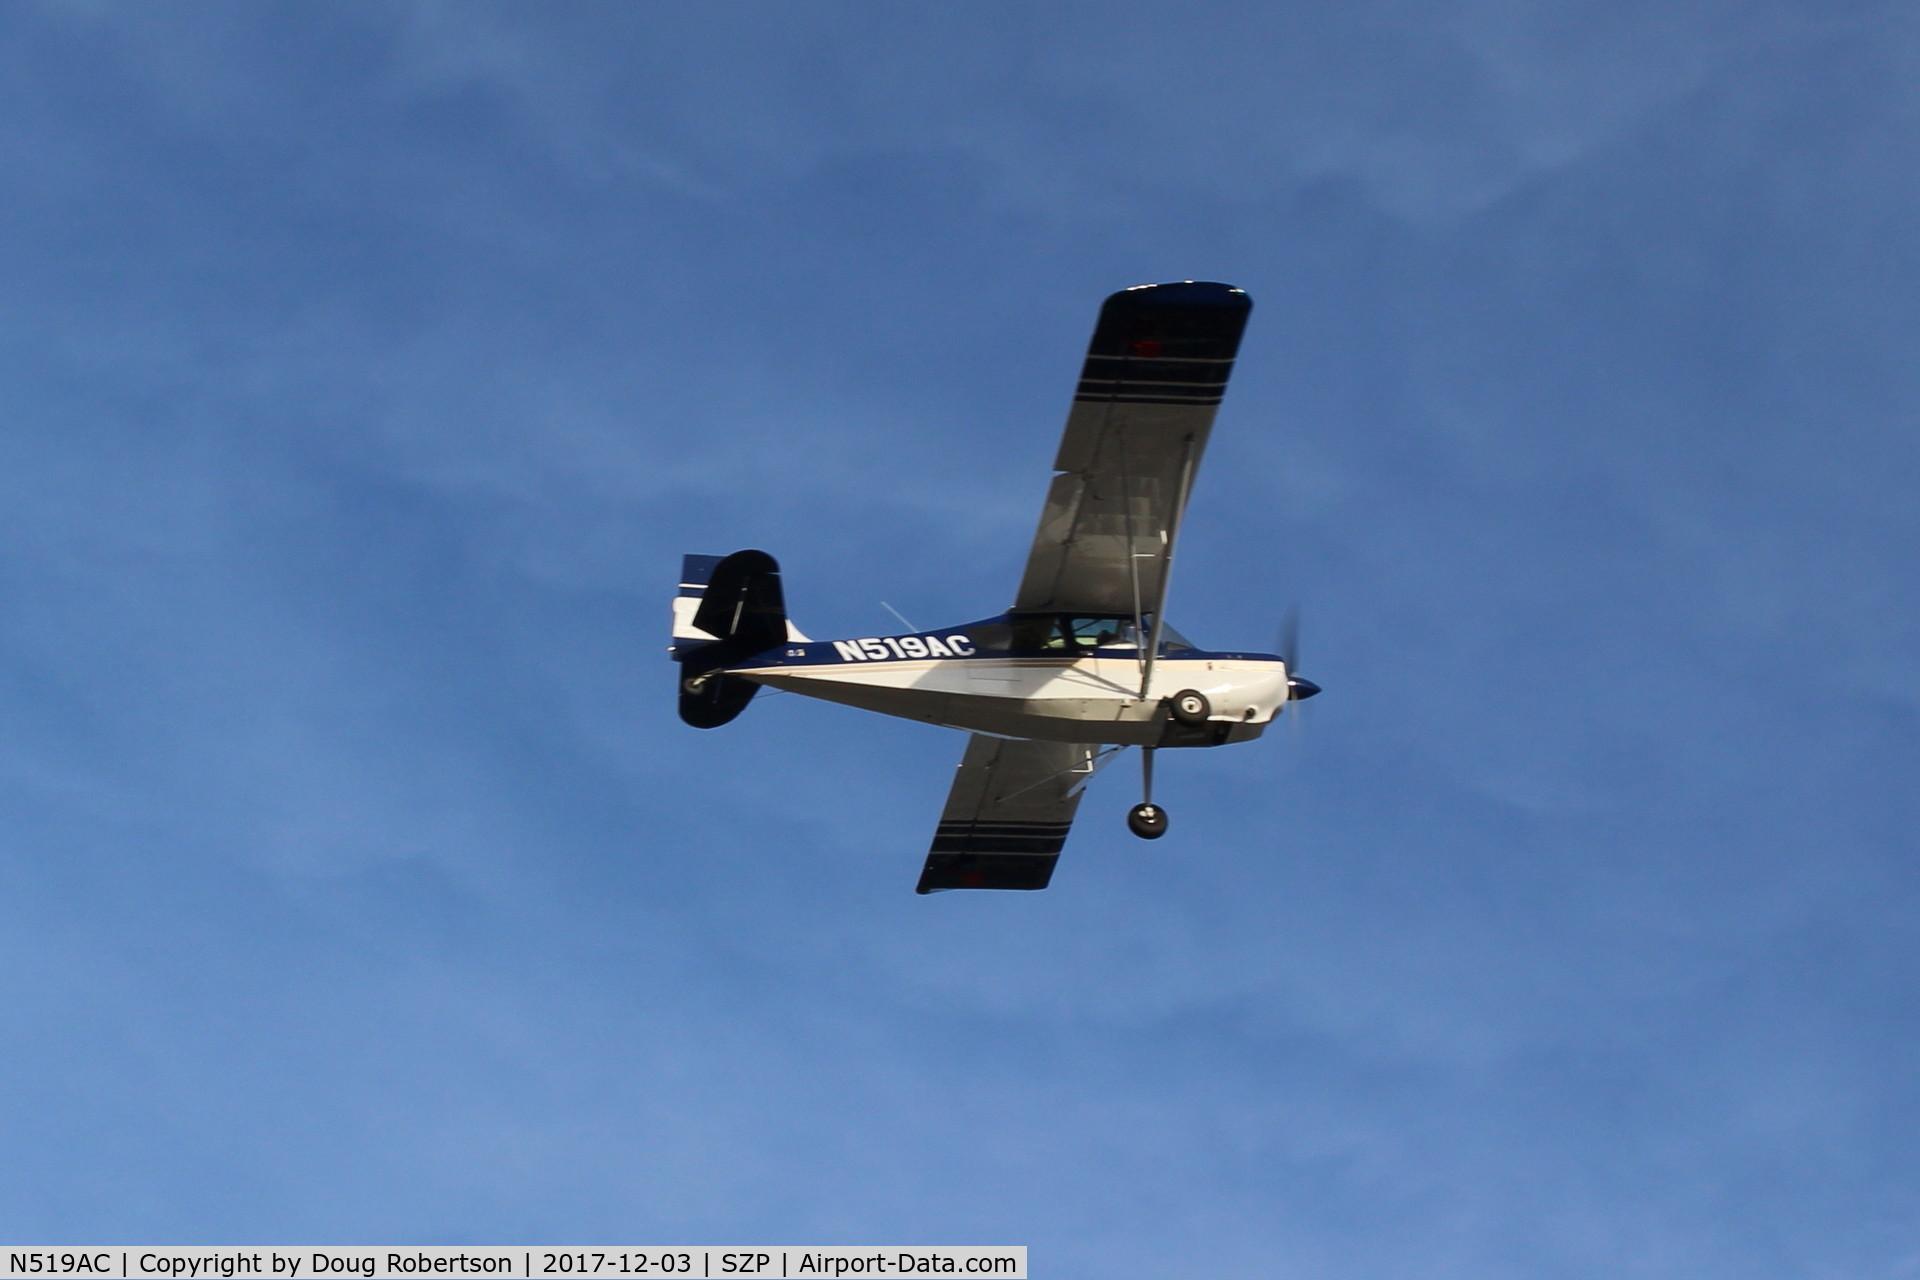 N519AC, 2000 American Champion 7GCBC C/N 1295-2000, 2000 American Champion 7GCBC EXPLORER, Lycoming O-320 150 Hp, takeoff climb Rwy 04